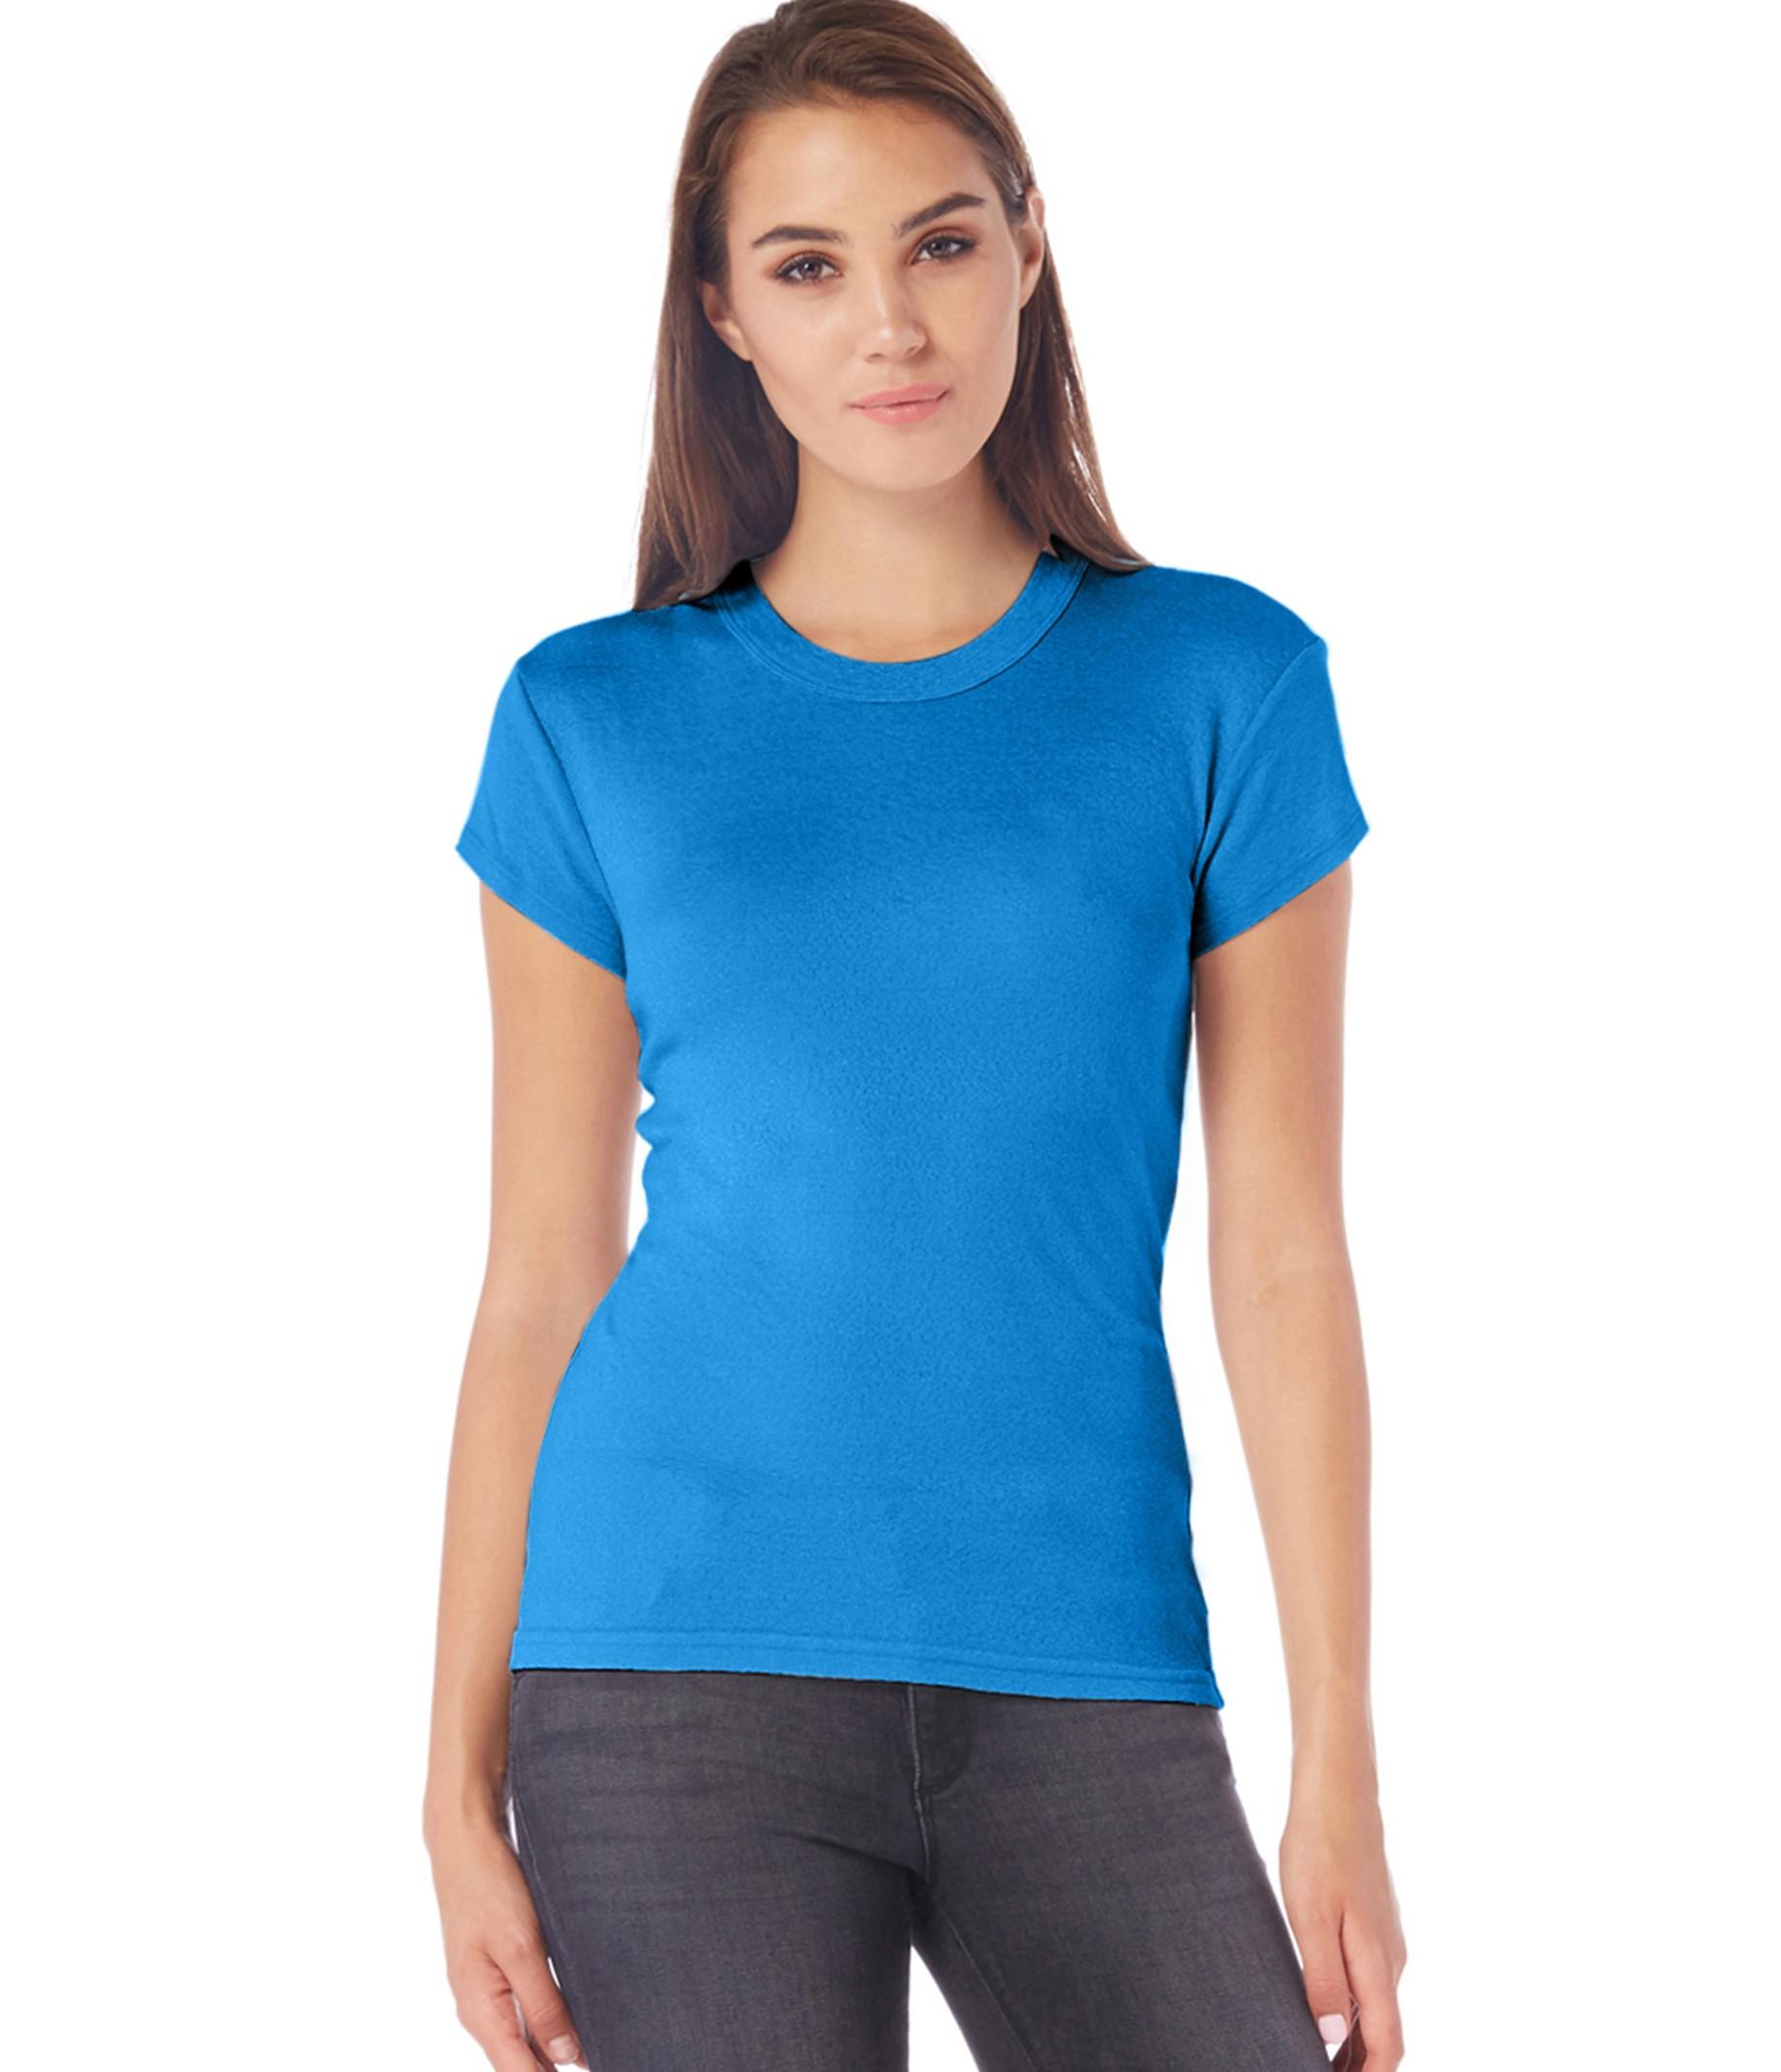 Michael stars shine capsleeve crew neck tee in blue cove for Michael stars tee shirts